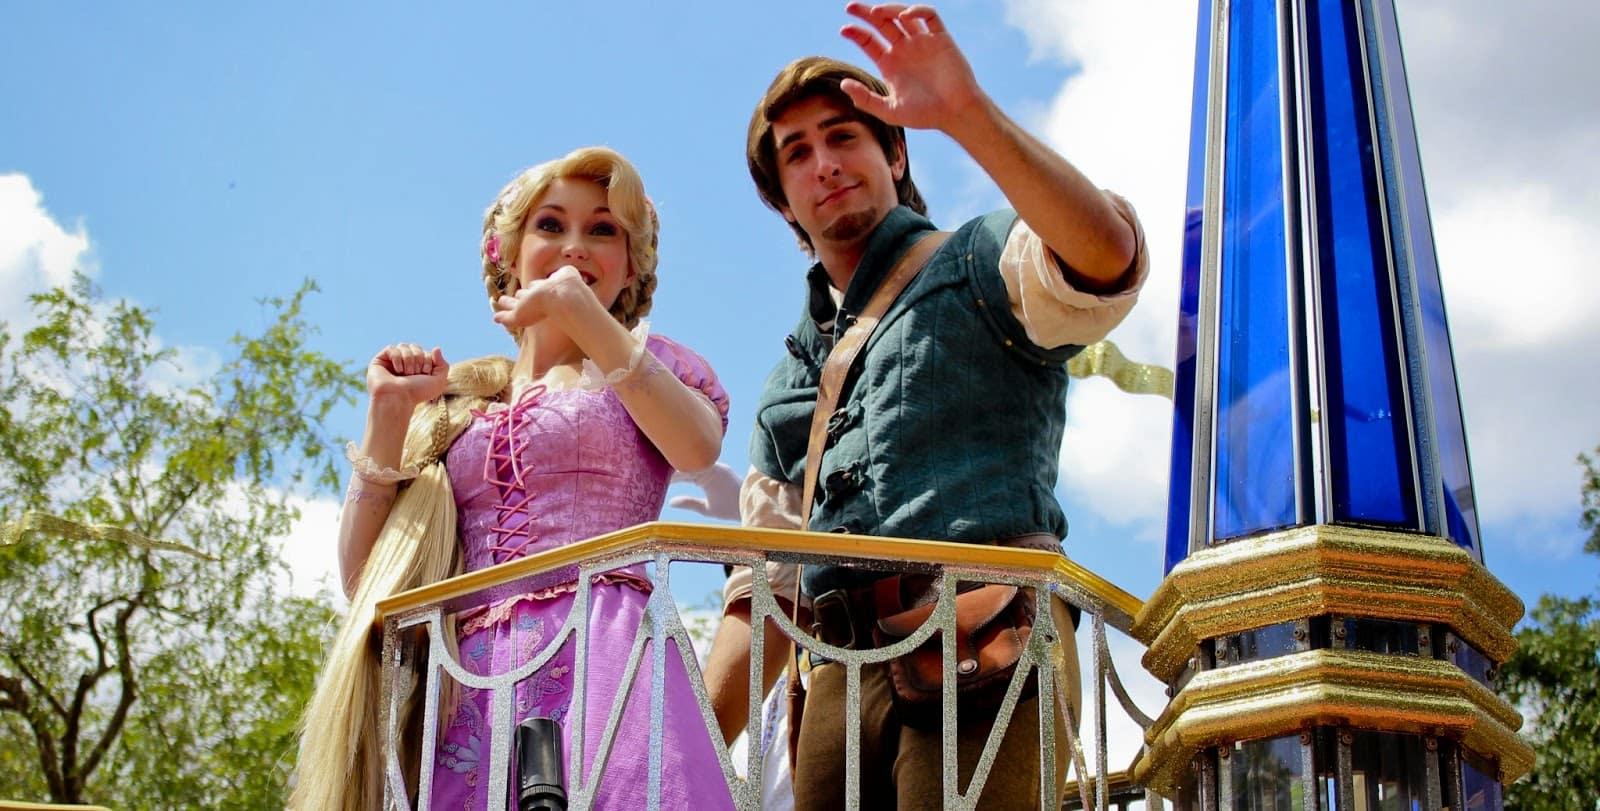 Where to meet the Disney princesses at every park